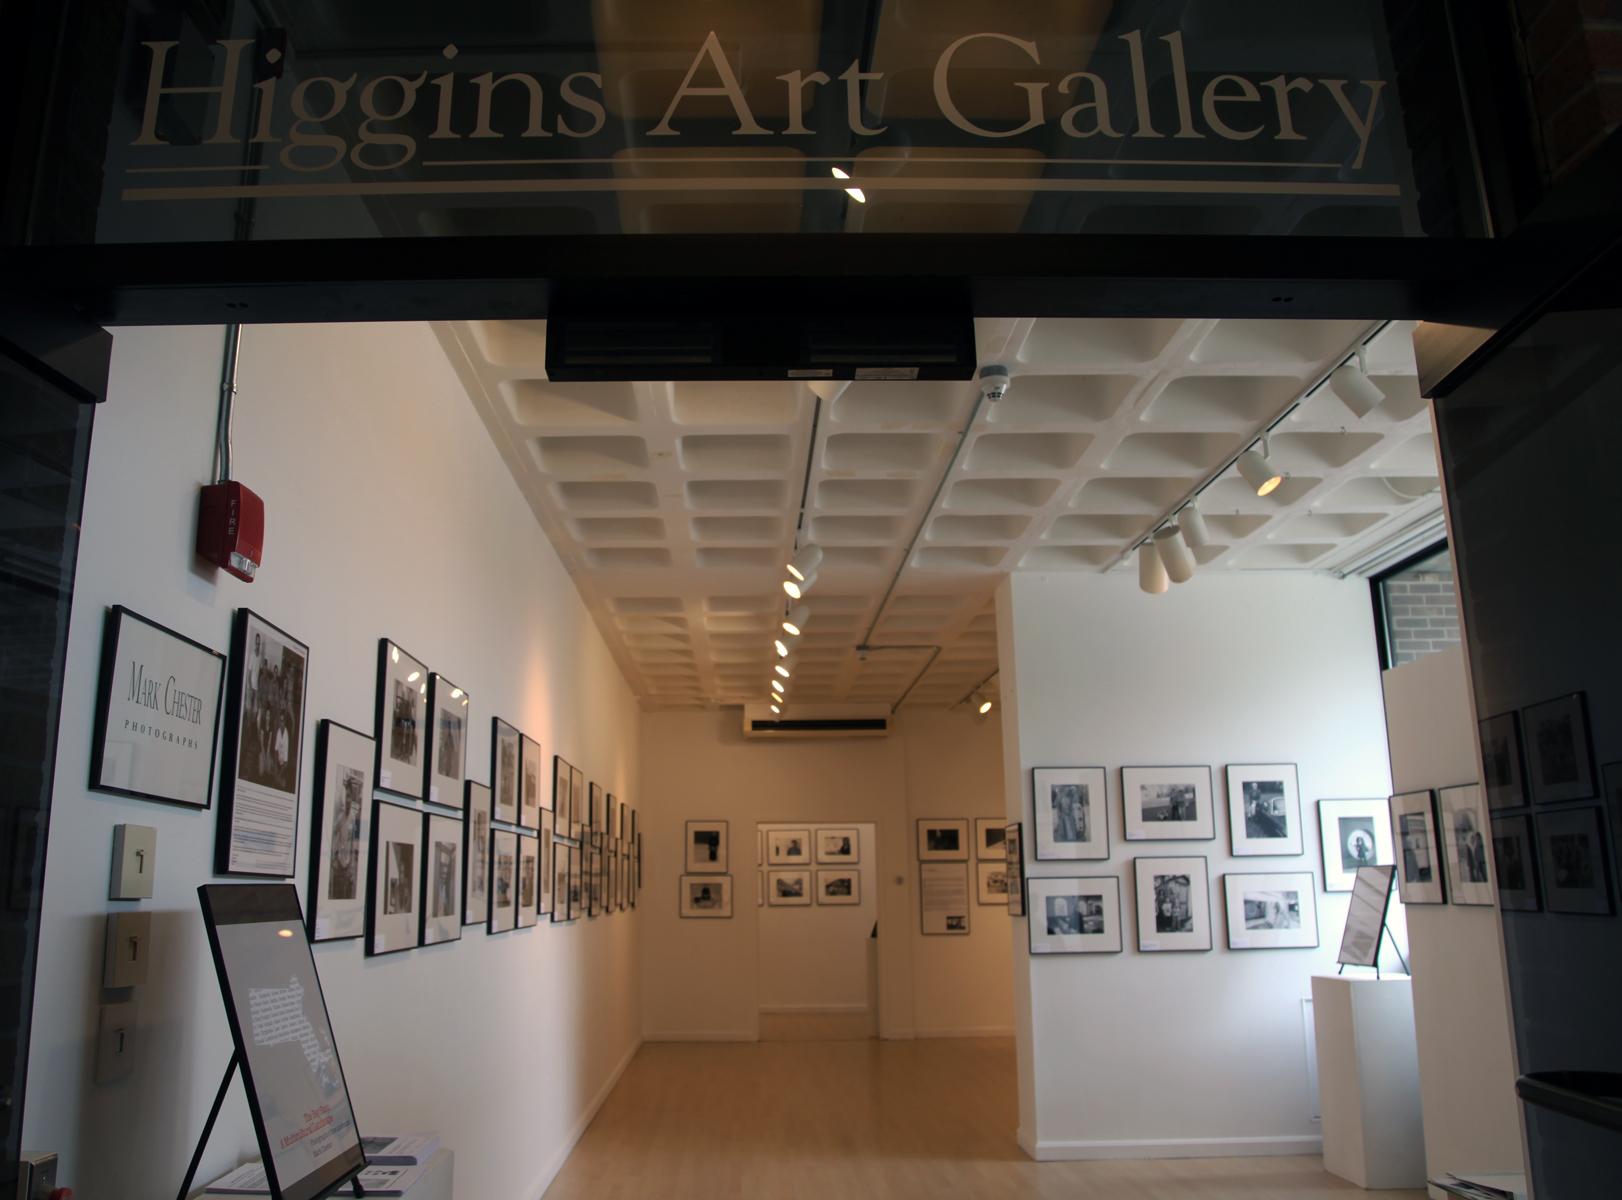 Higgins Art Gallery sign entry_0710.jpg